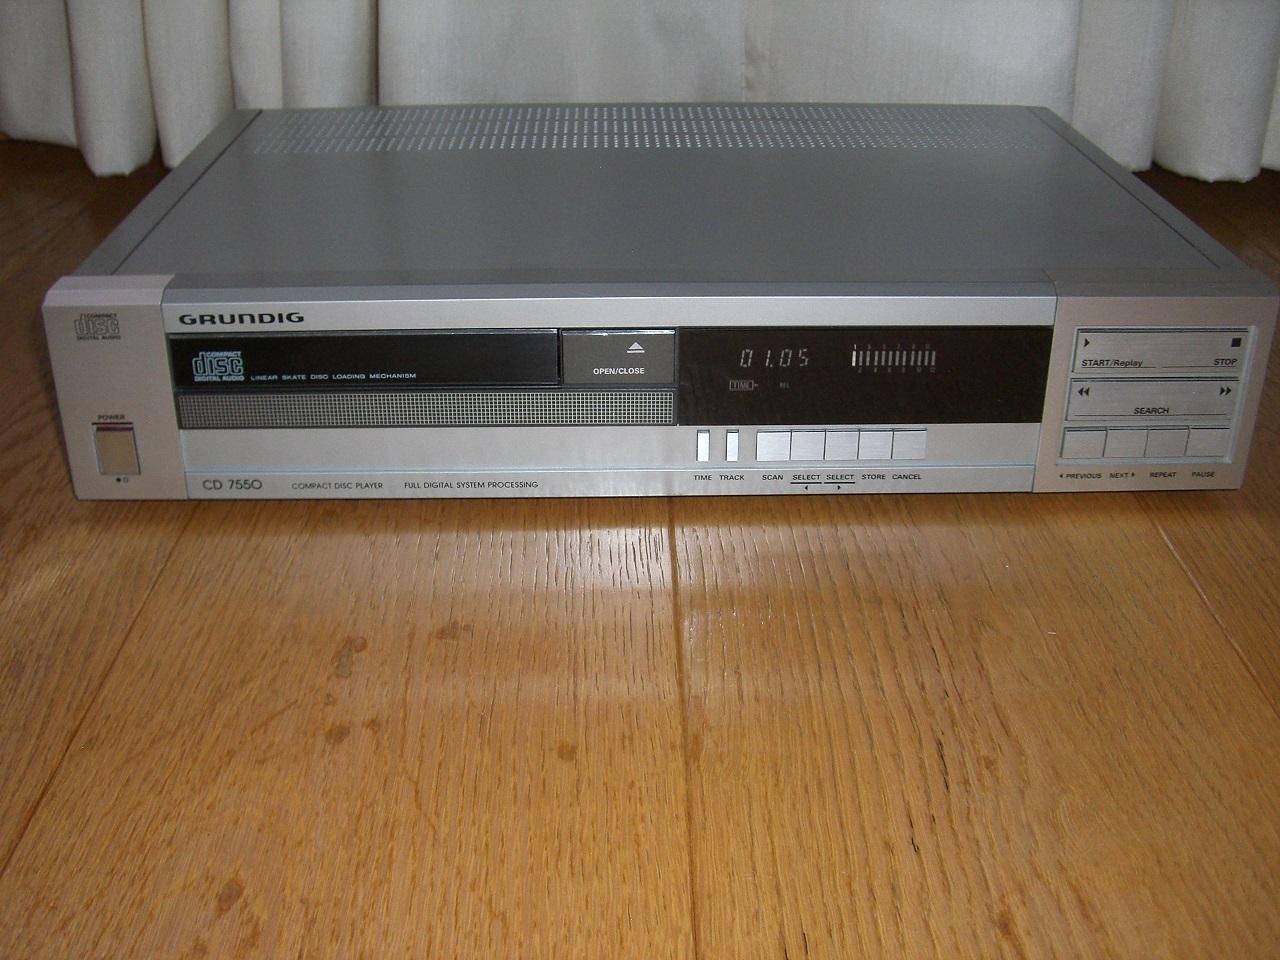 grundig cd 7550 modifiziert restauriert non os gebraucht. Black Bedroom Furniture Sets. Home Design Ideas